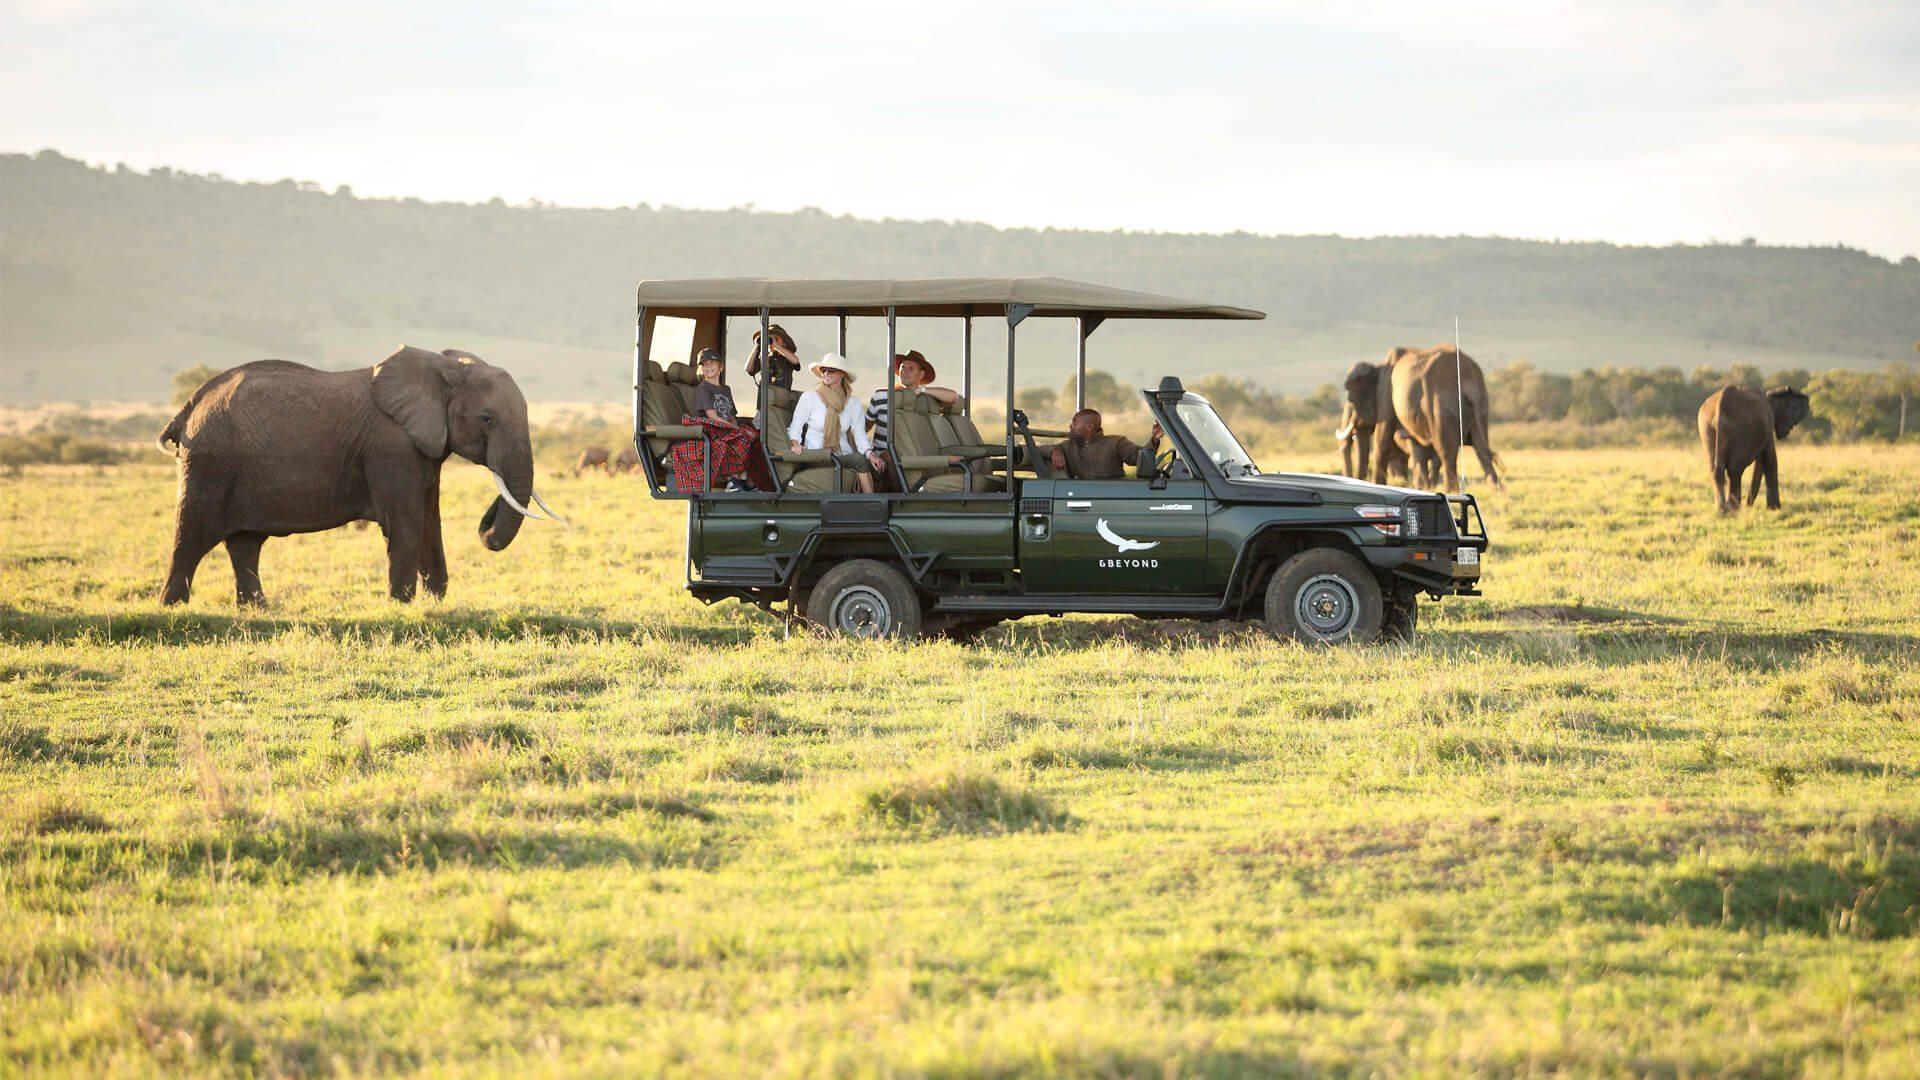 Masai Mara The Best Place for Safari in Kenya